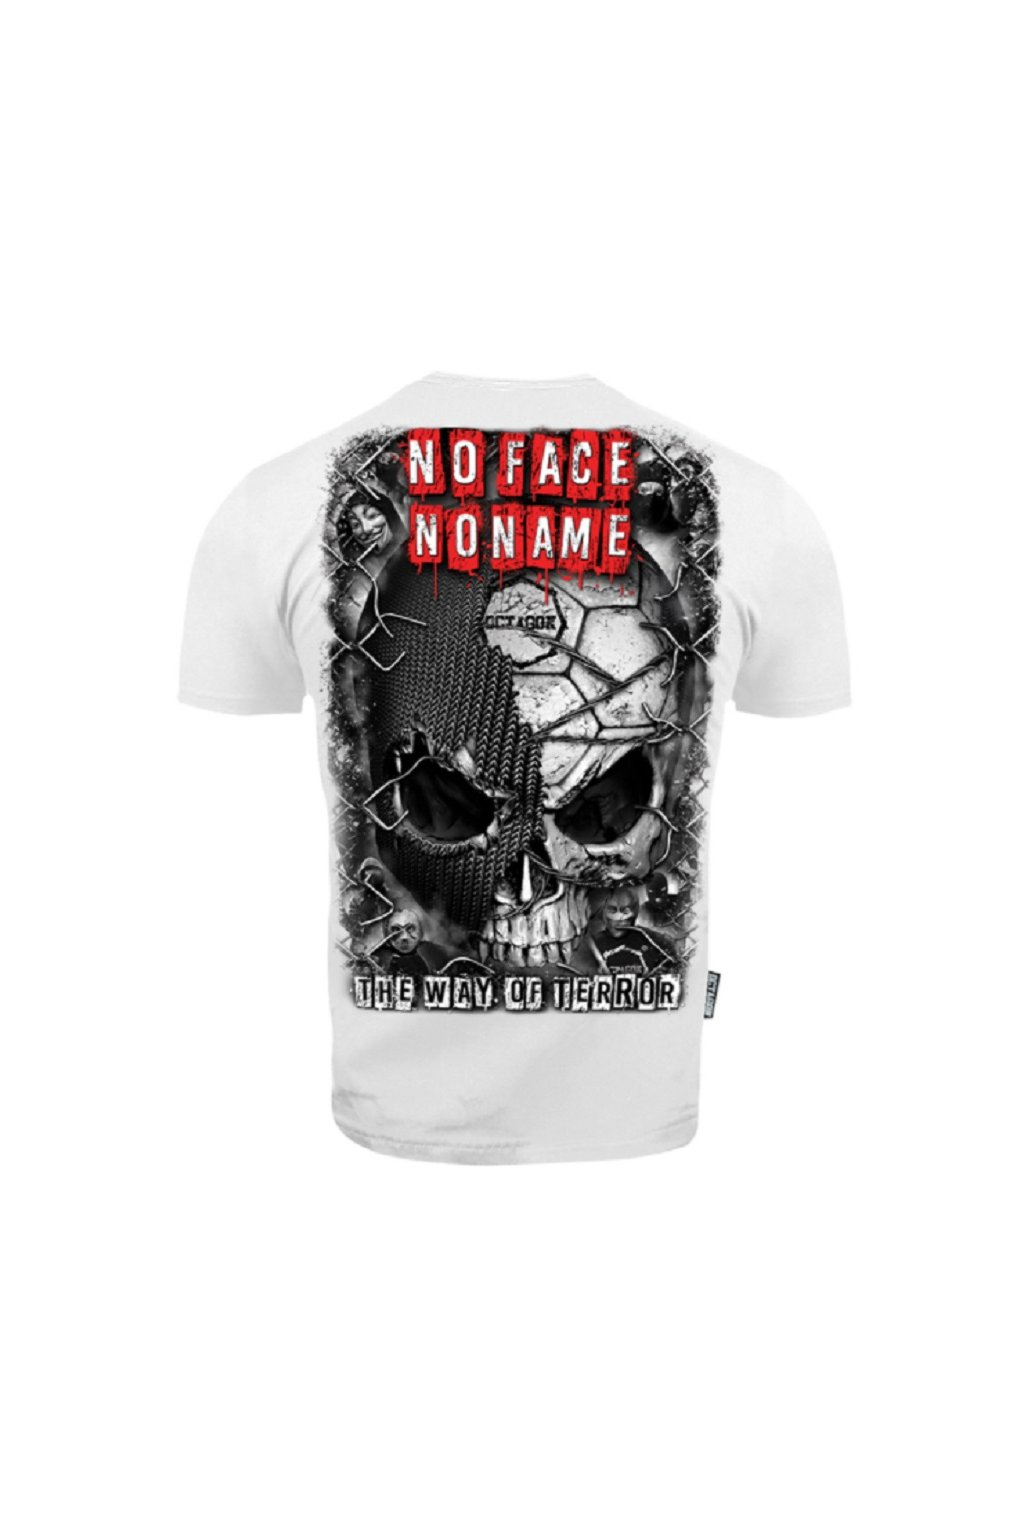 Pánské tričko OCTAGON THE WAY OF TERROR BÍLÁ obr1